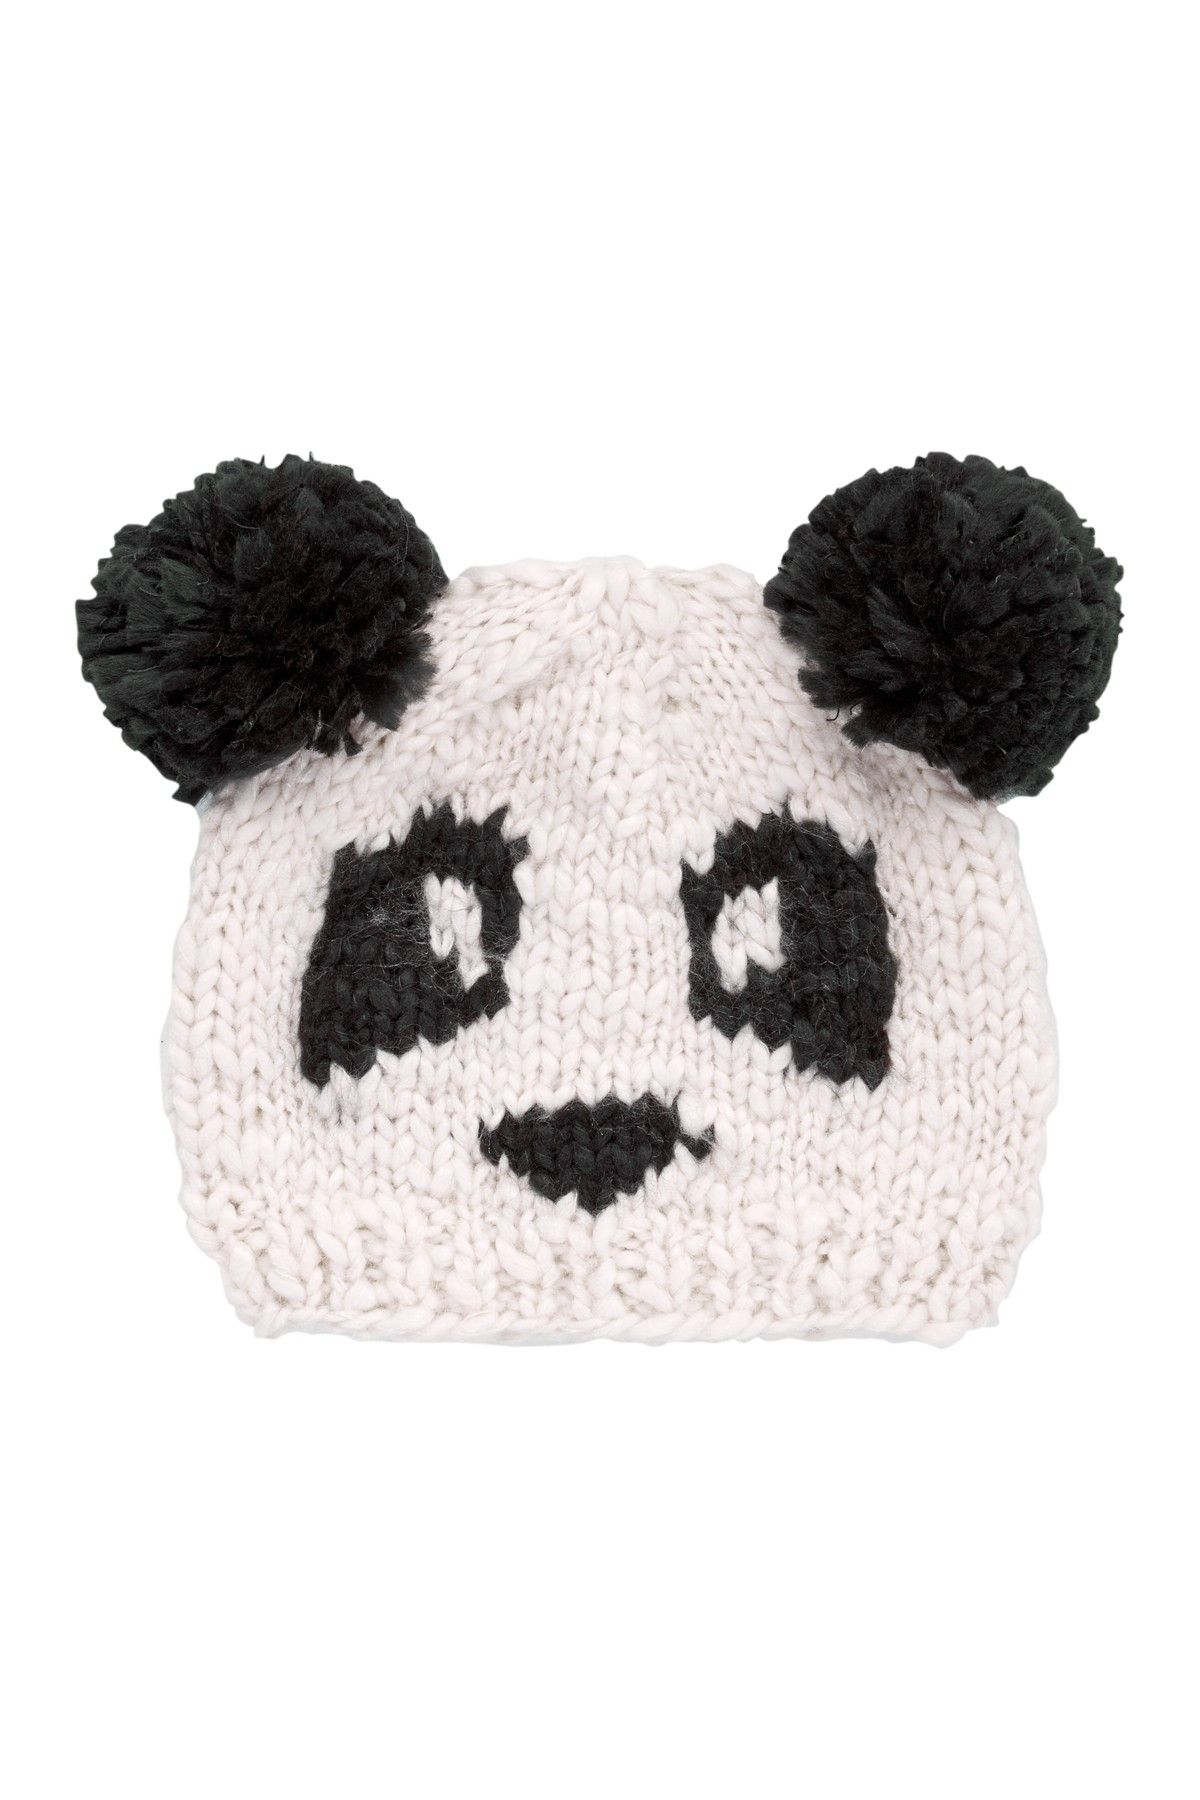 Panda Mütze Inspiration Pinterest